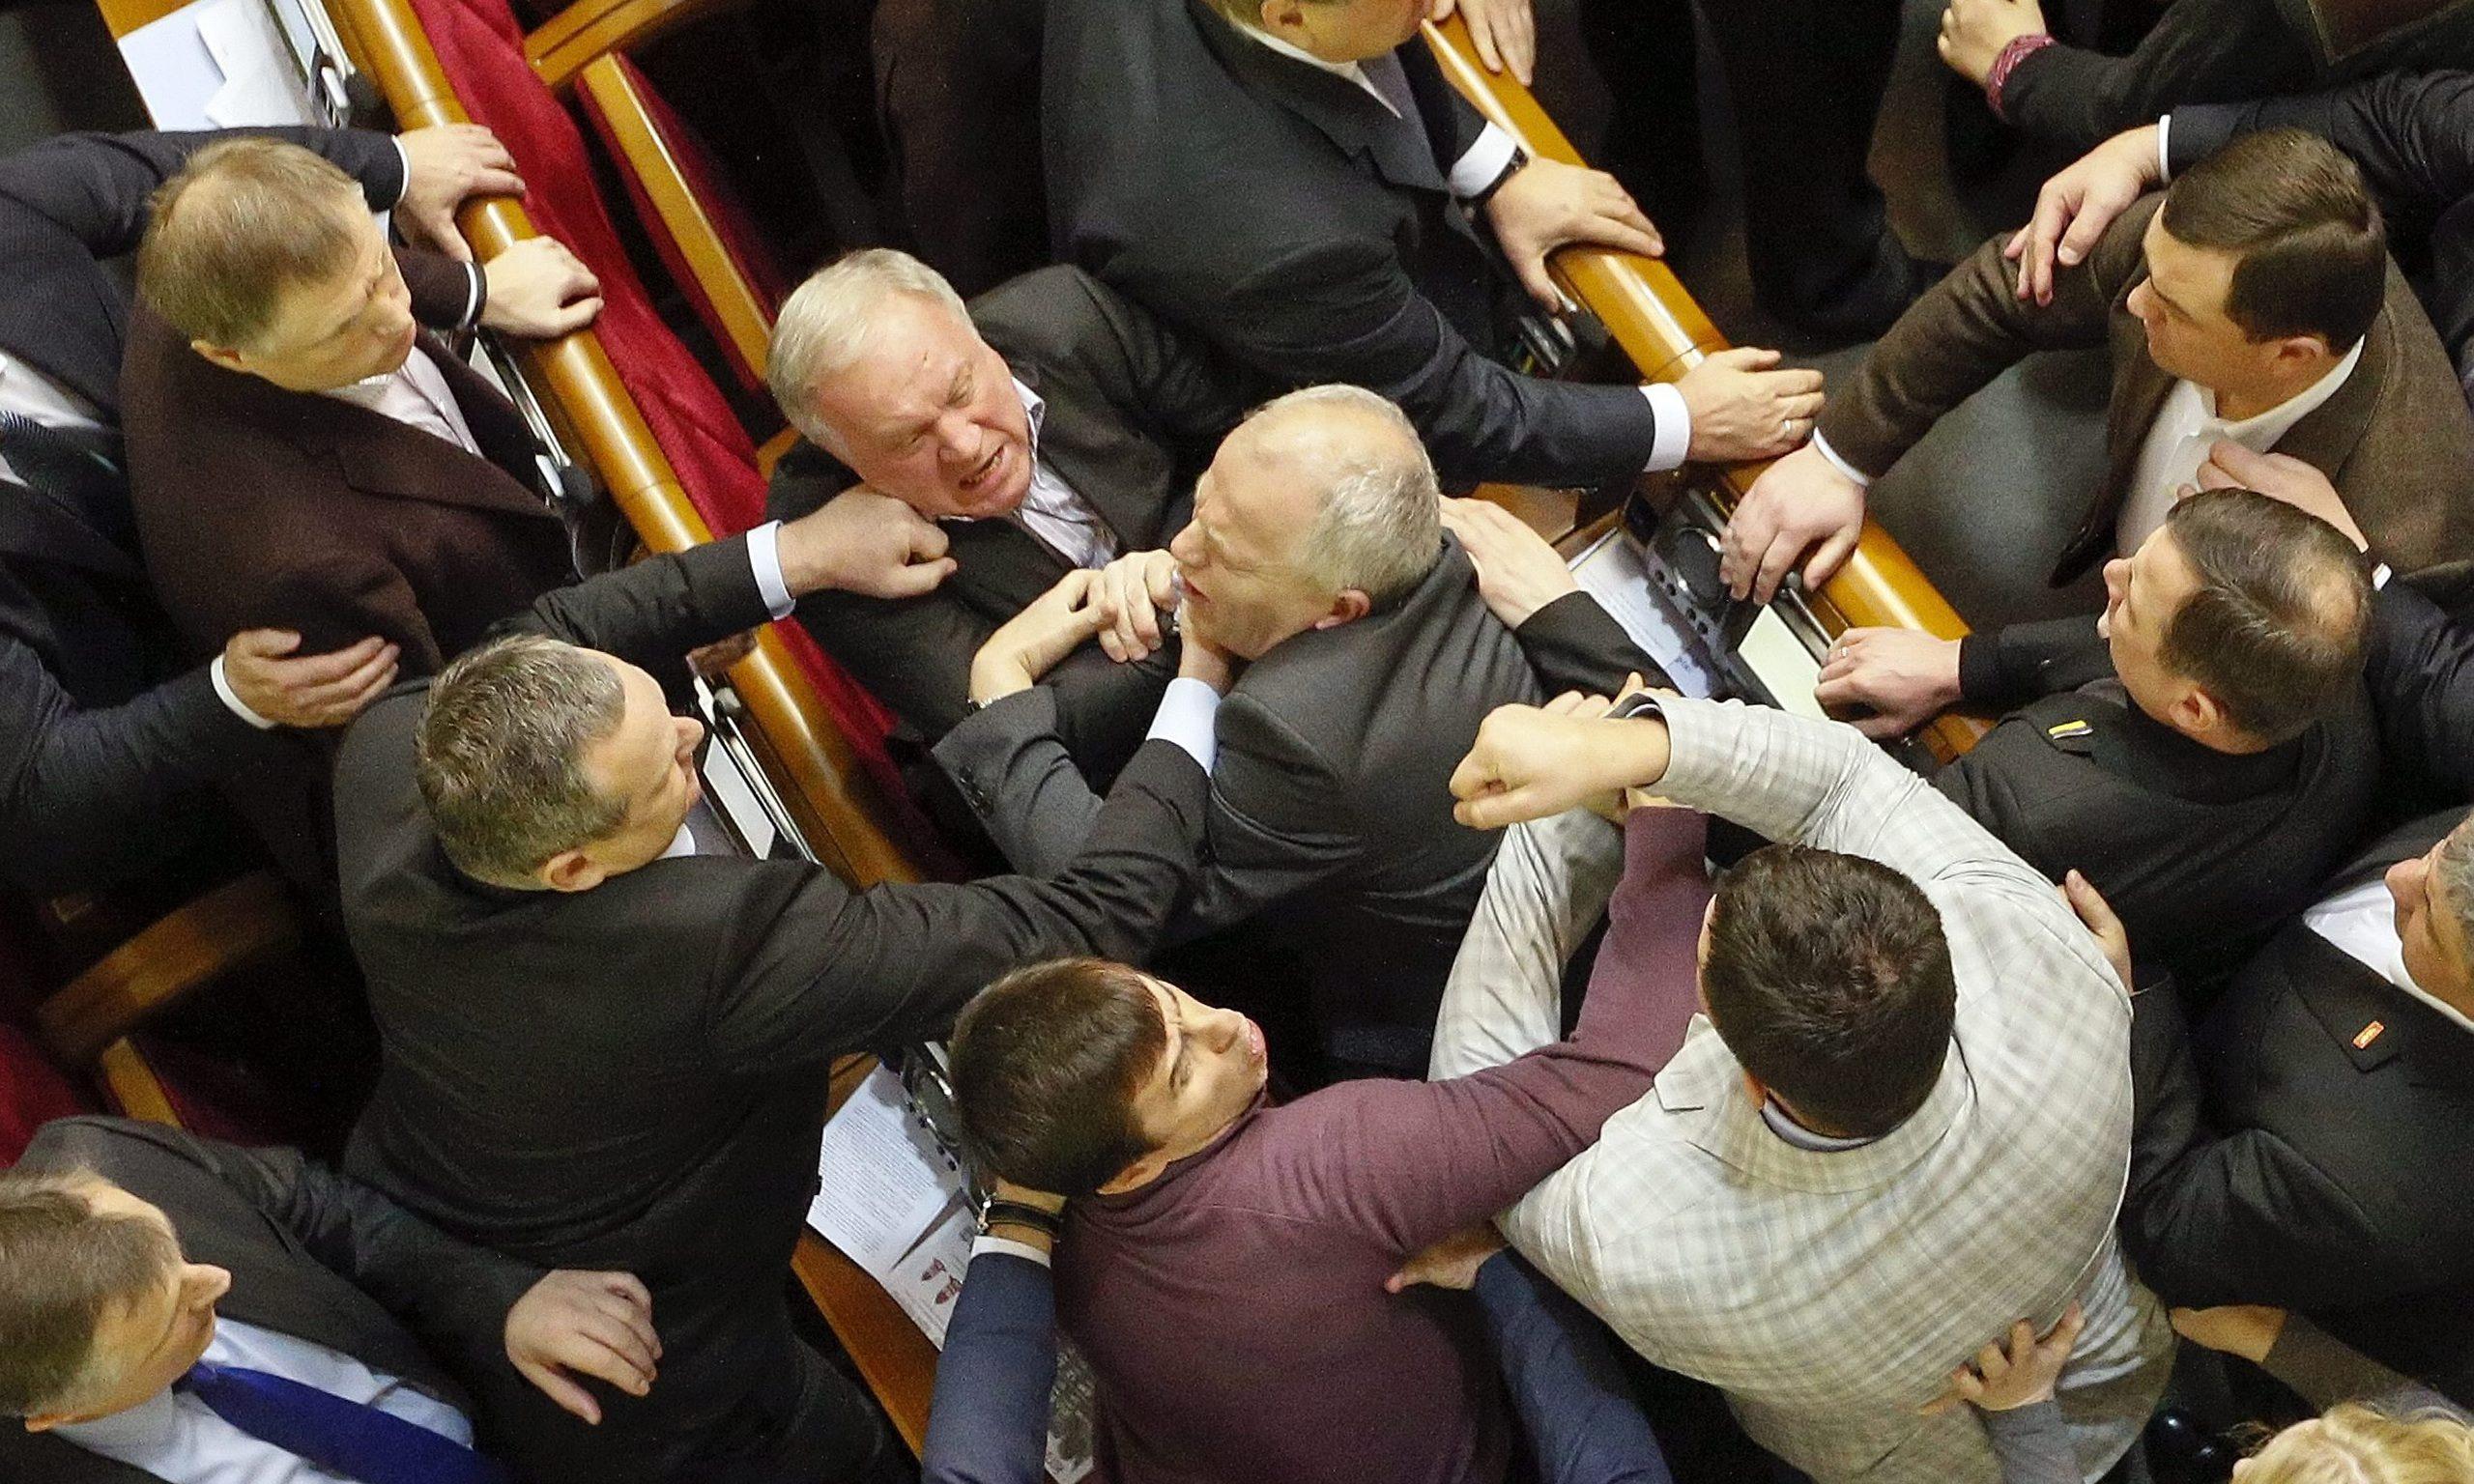 Photograph: Sergey Dolzhenko/EPA